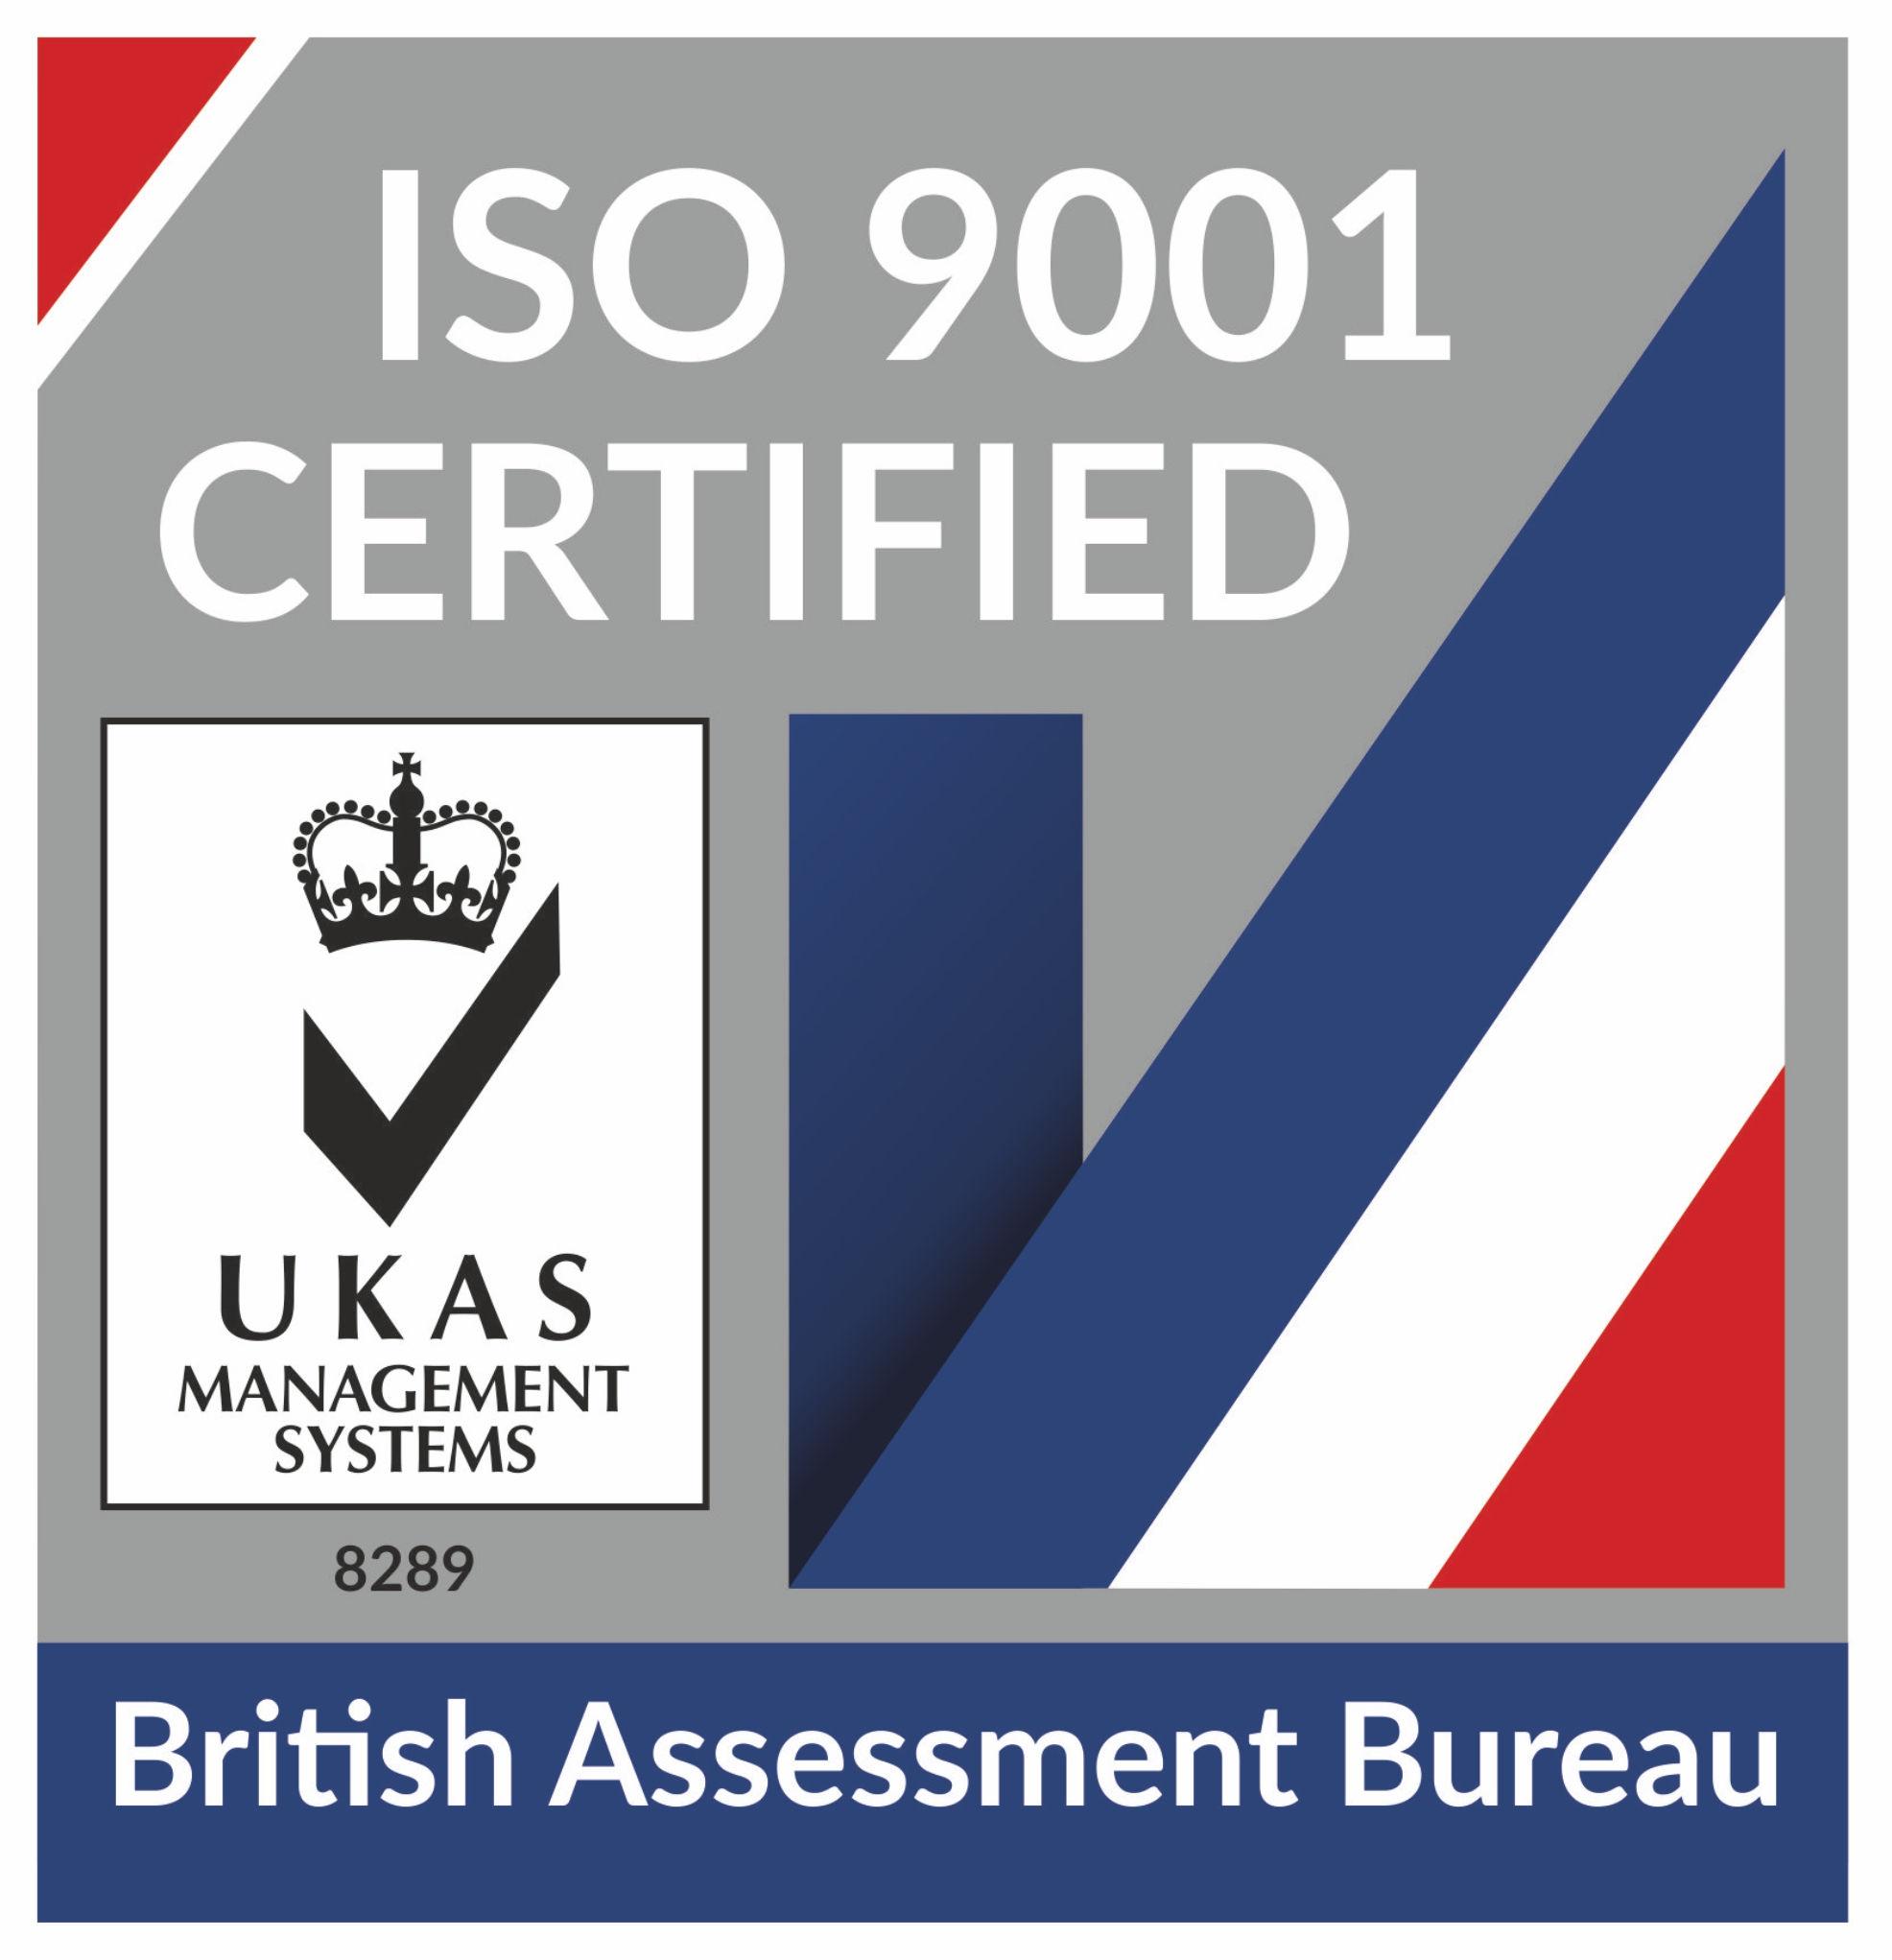 ACS - ISO 9001